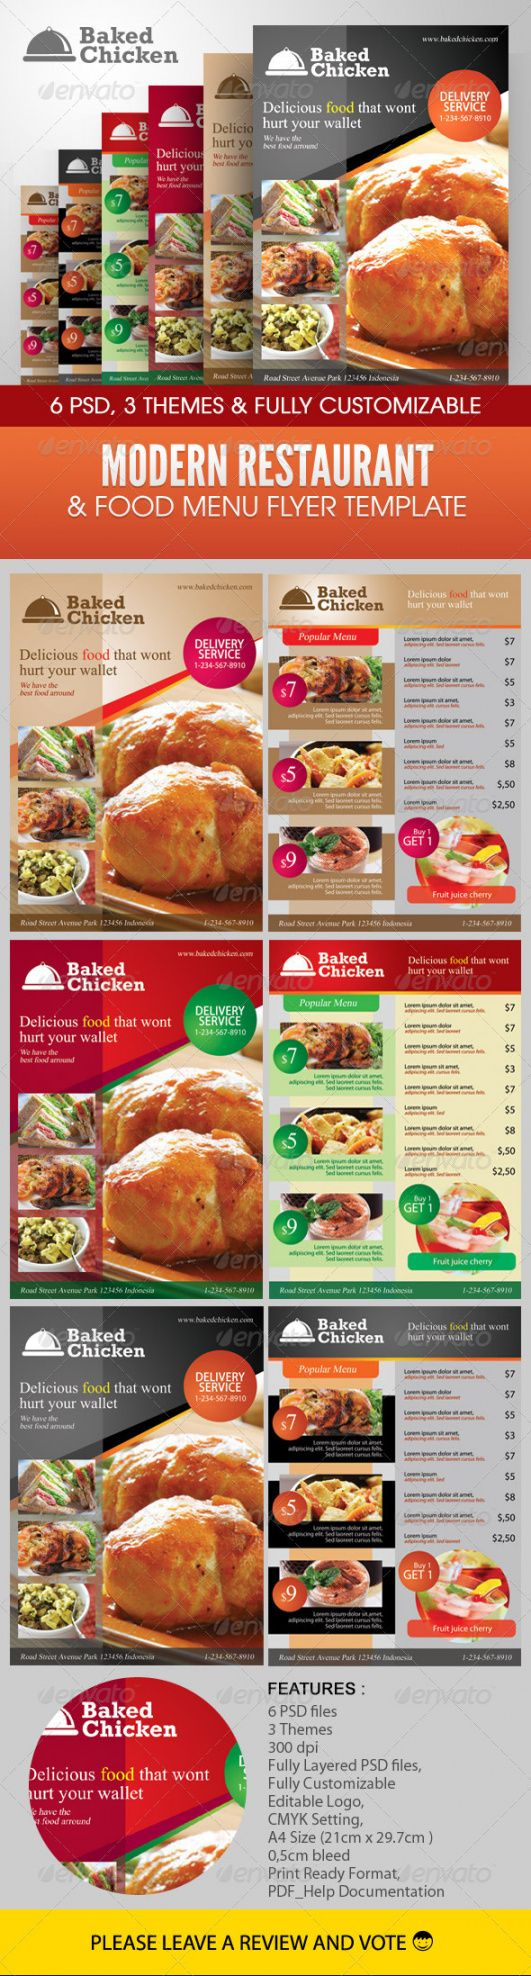 free modern restaurant food menu flyer template modern restaurant food menu flyer template doc